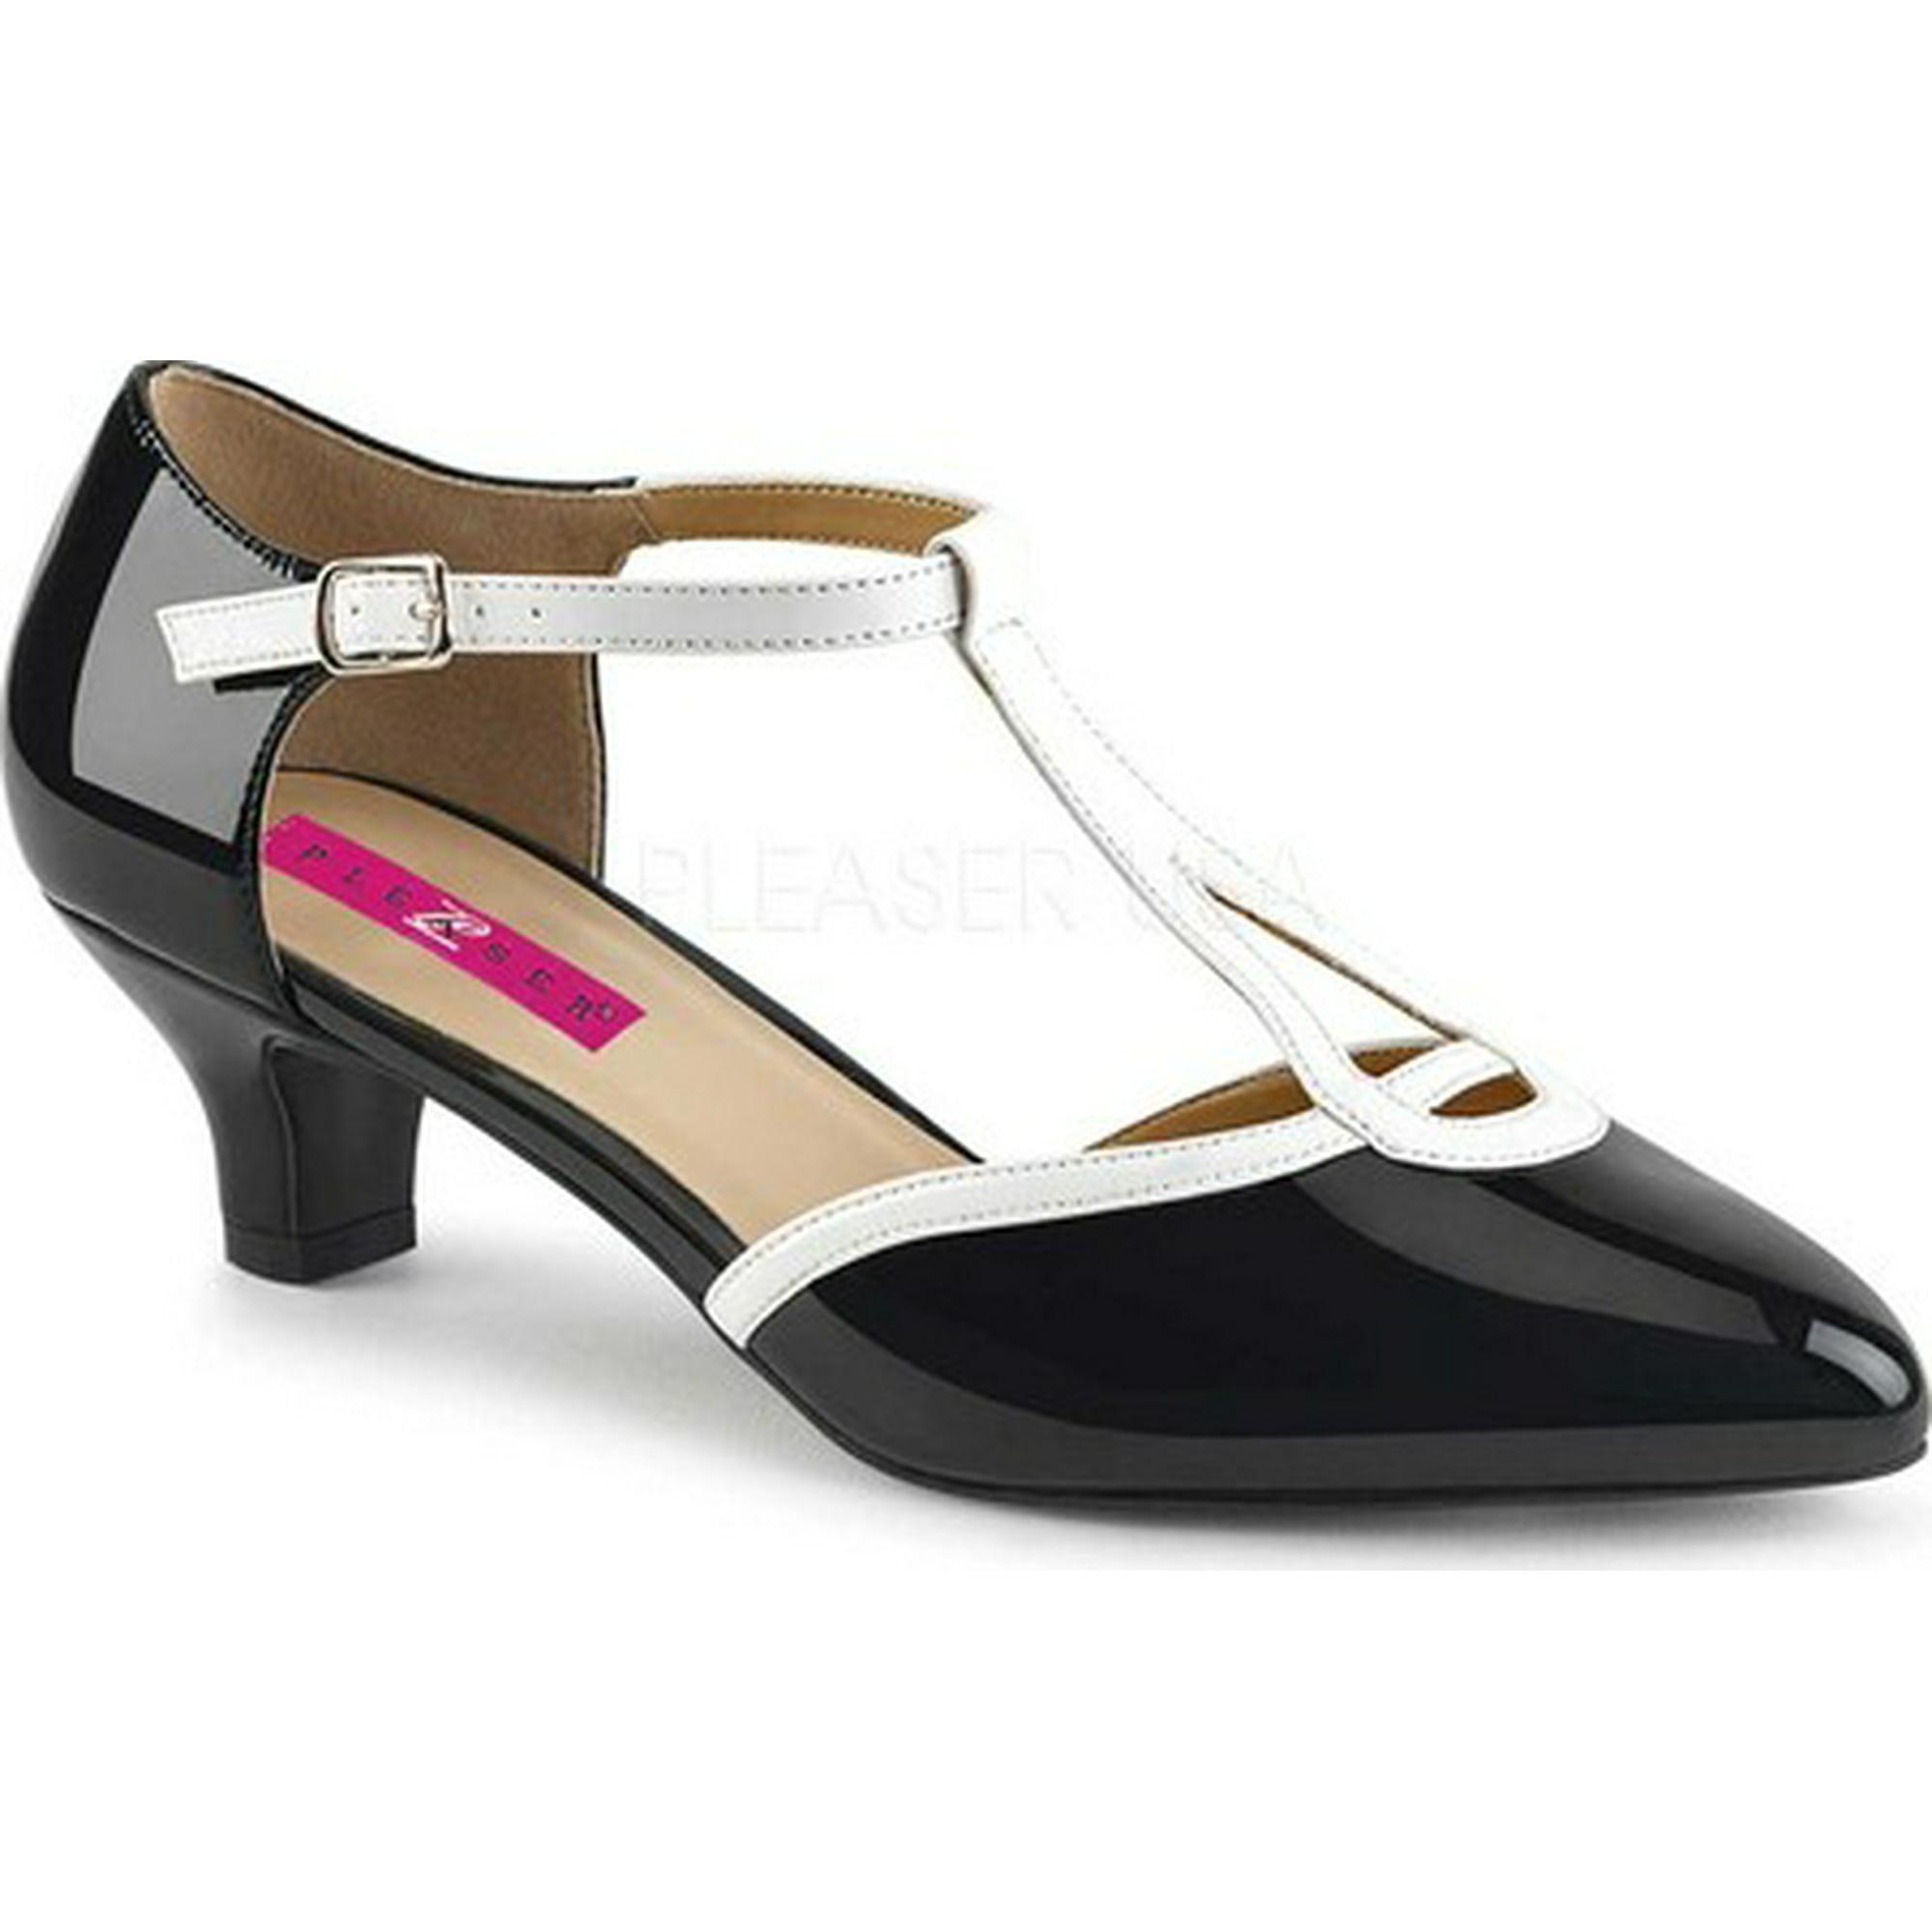 42df2b856b9 Women s Pleaser Pink Label Fab 428 T-Strap Red-Black Patent 15 M ...